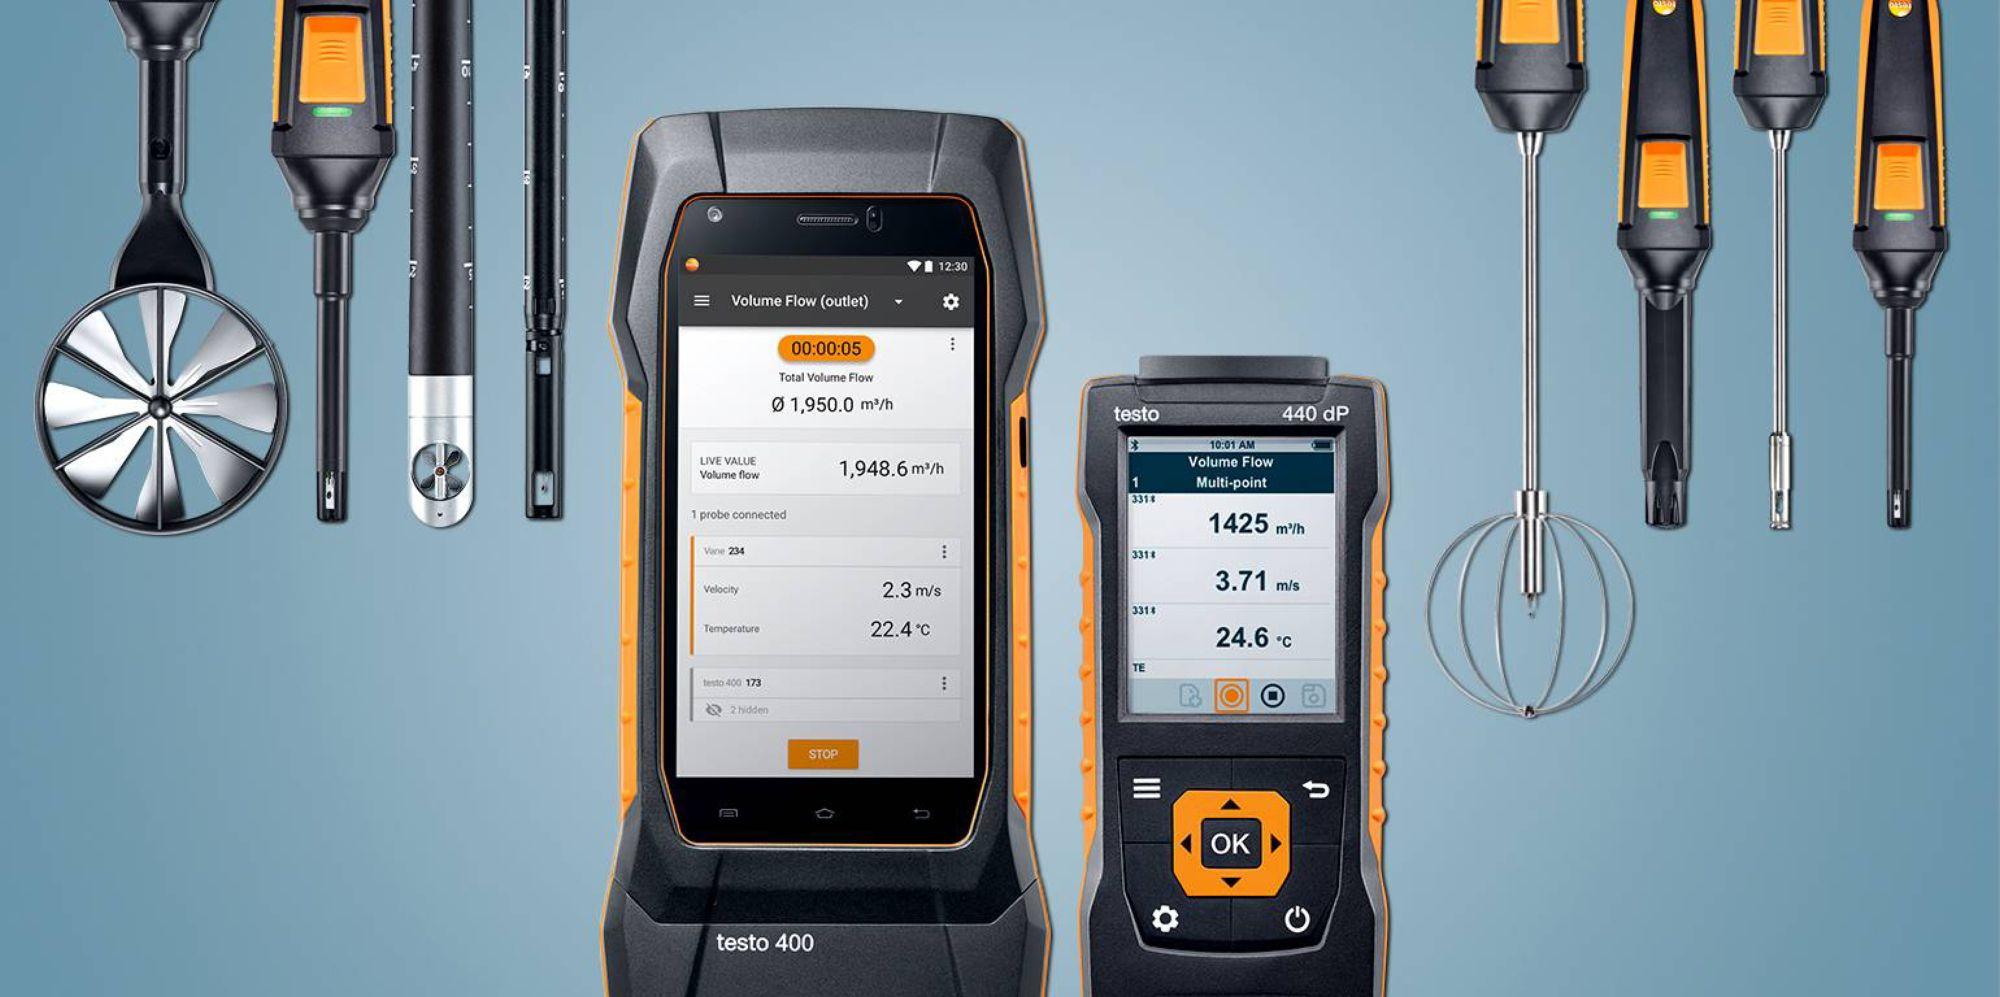 更多 IAQ 测量仪